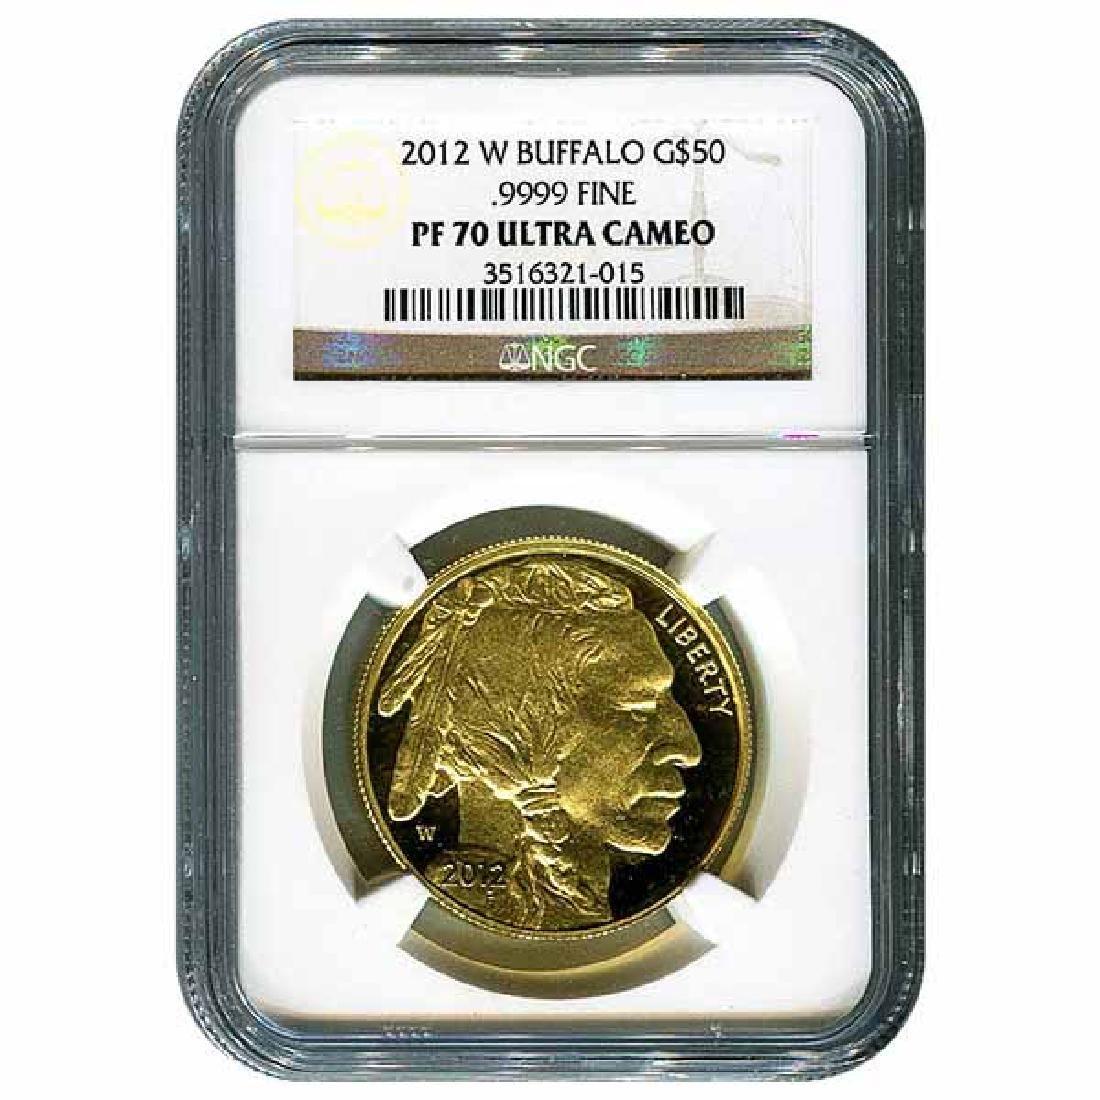 Certified Proof Buffalo Gold Coin 2012-W PF70 NGC